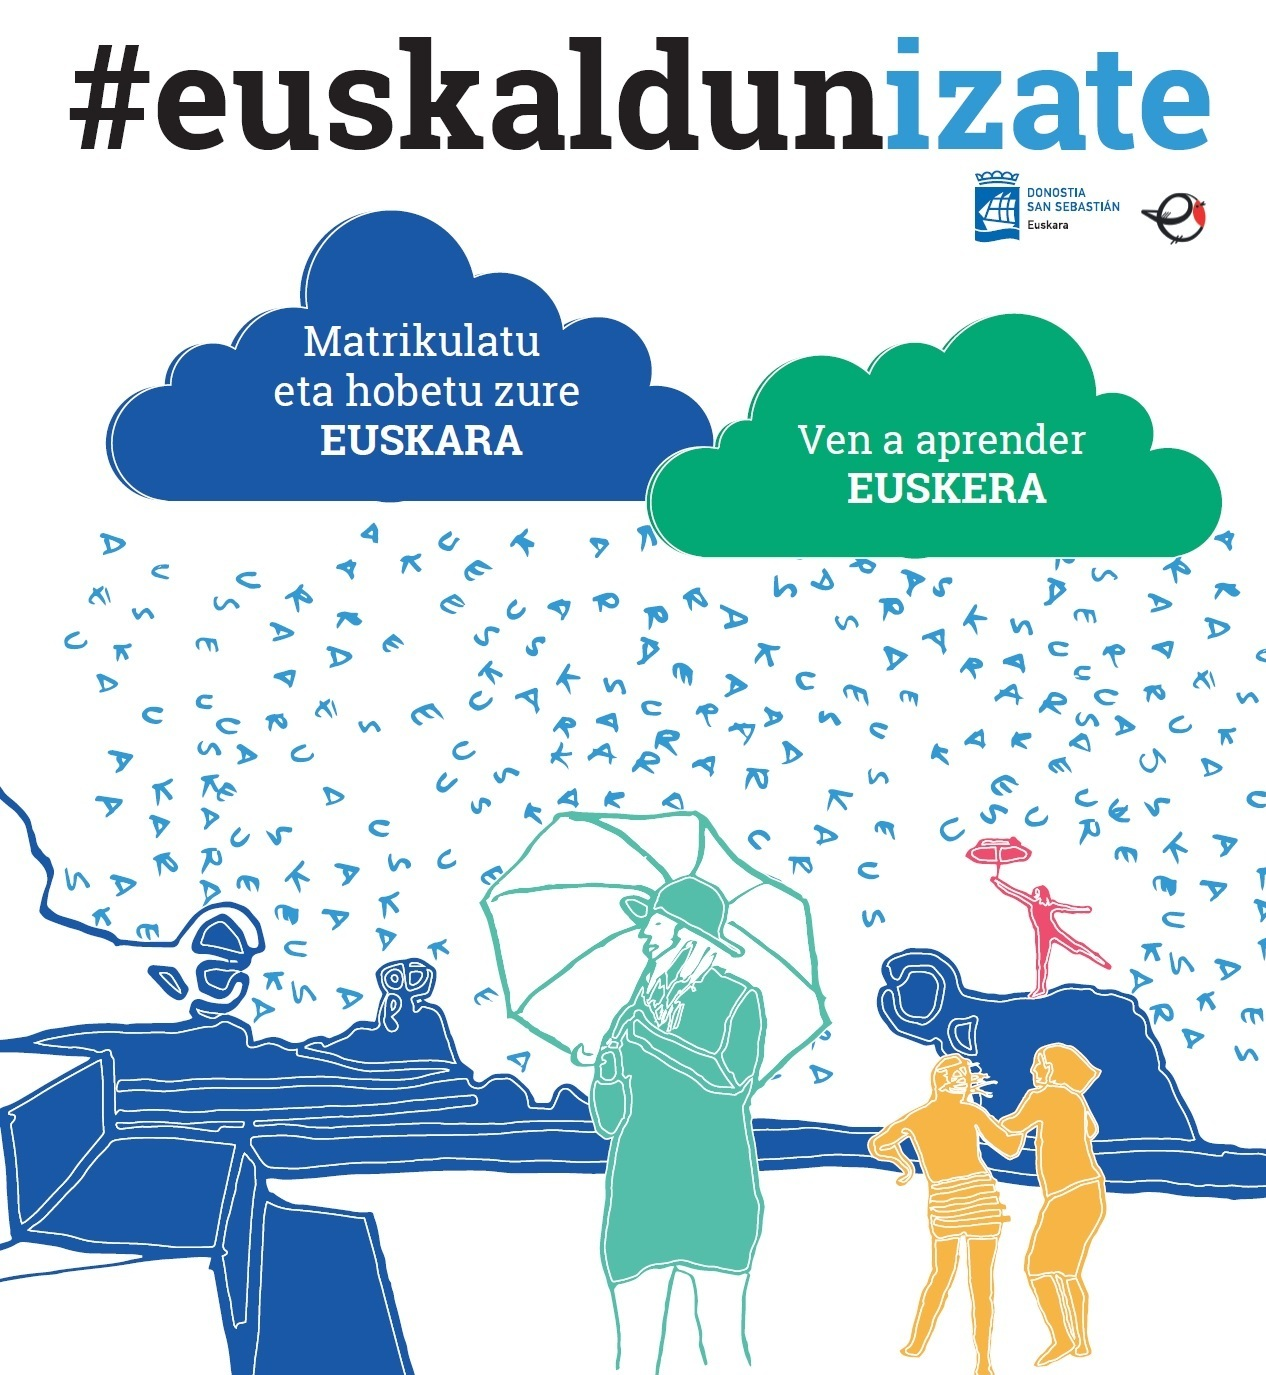 euskaldunizate 2019 2020